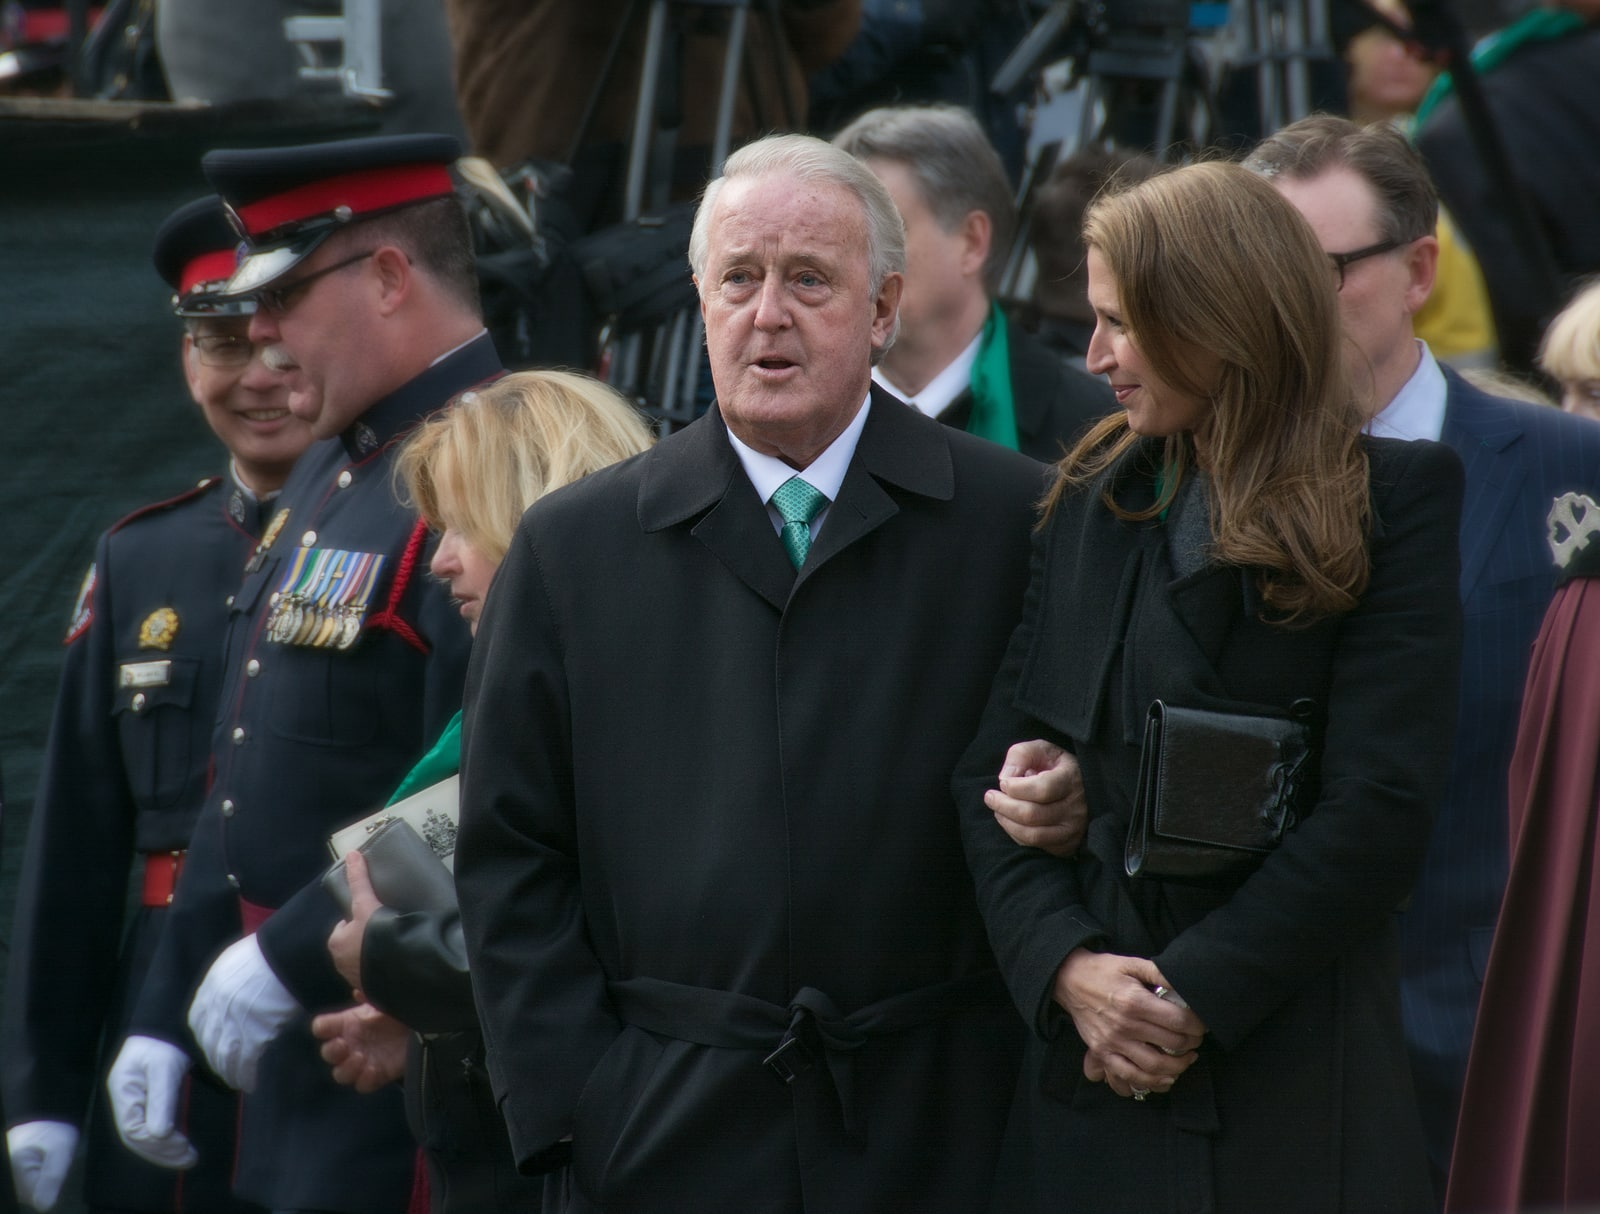 Brian Mulroney former Prime Minister of Canada